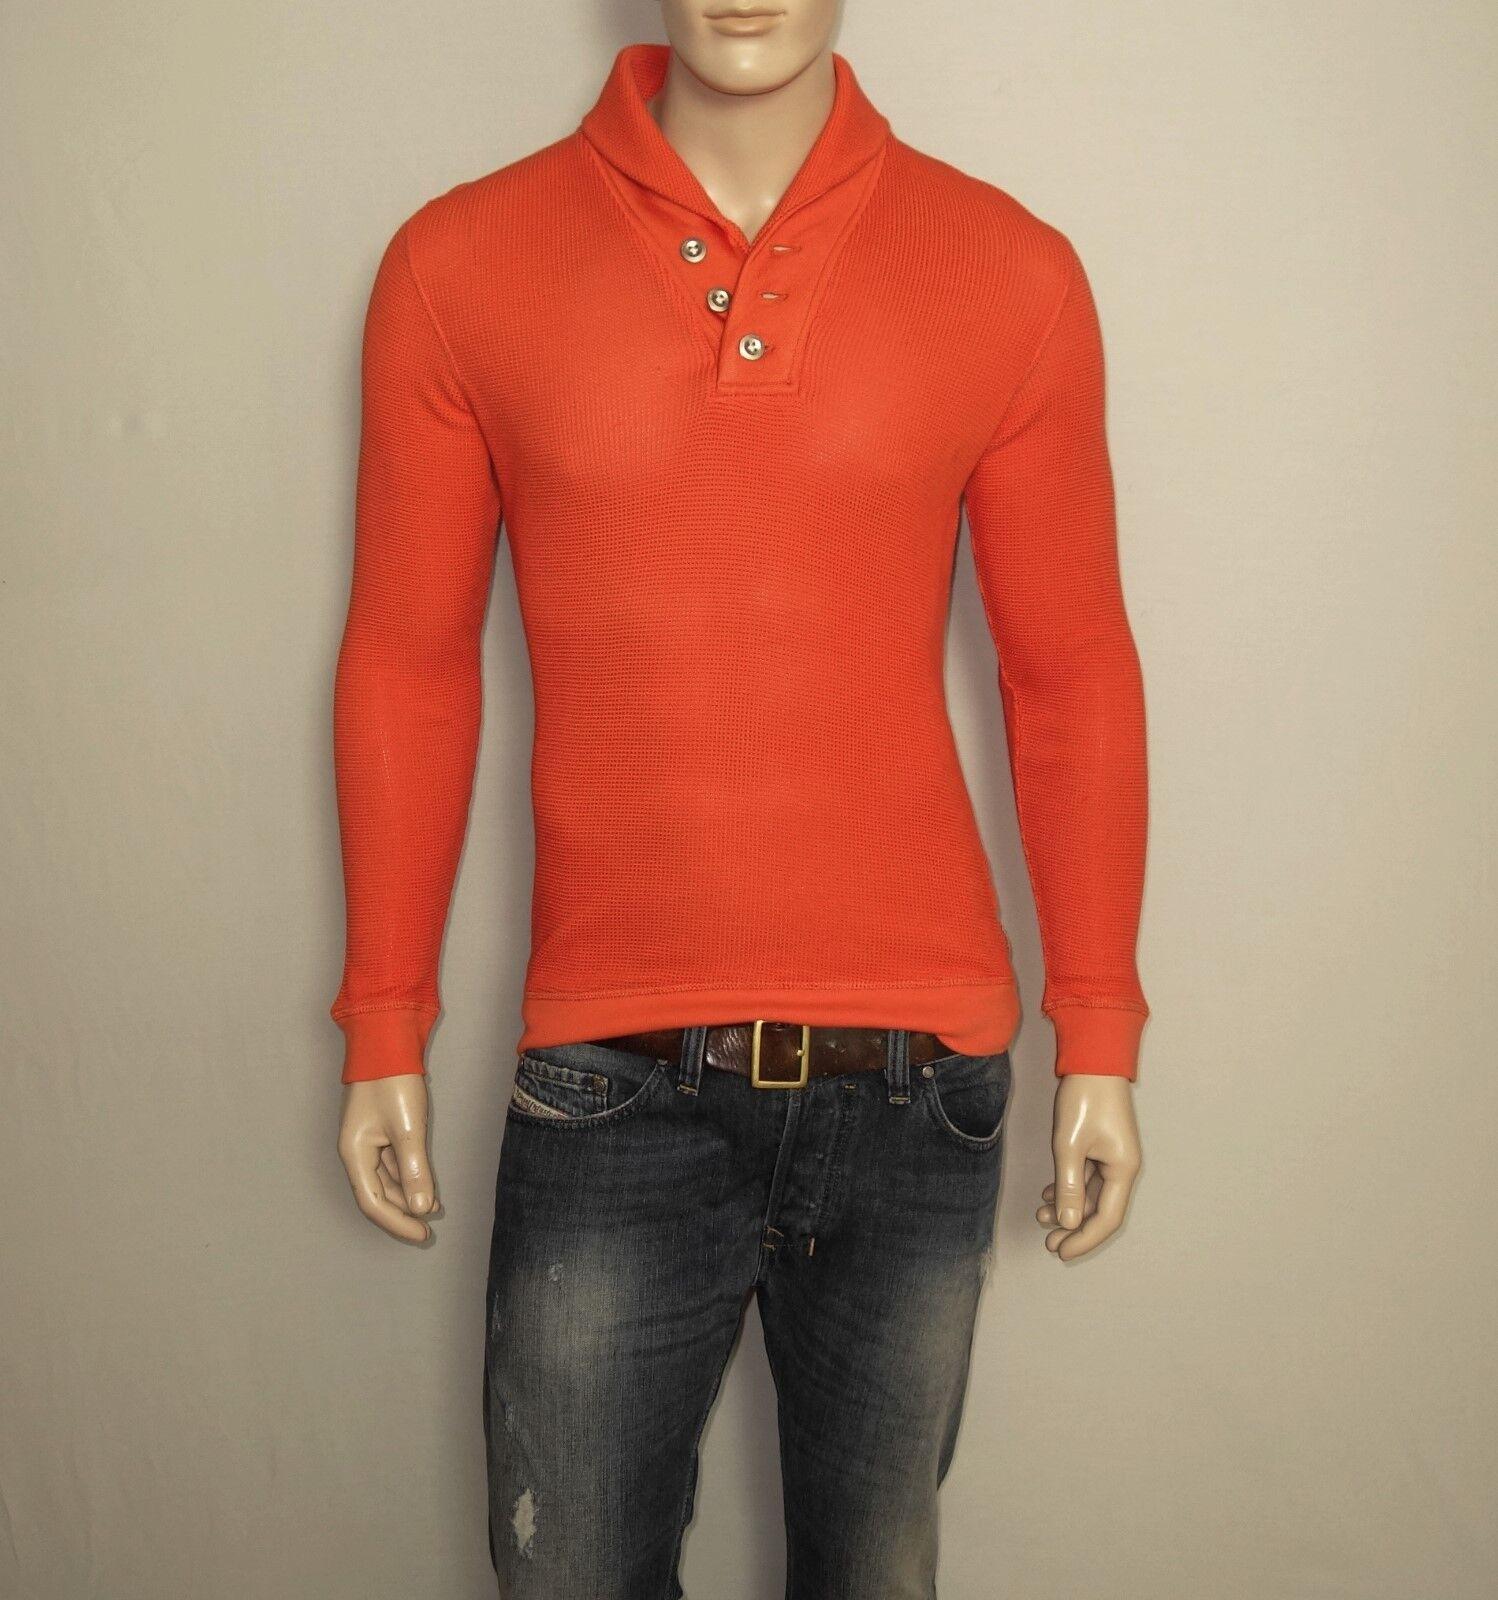 NEW DIESEL Sweat-Shirt in orange Size Small REGULAR Cotton Viscose